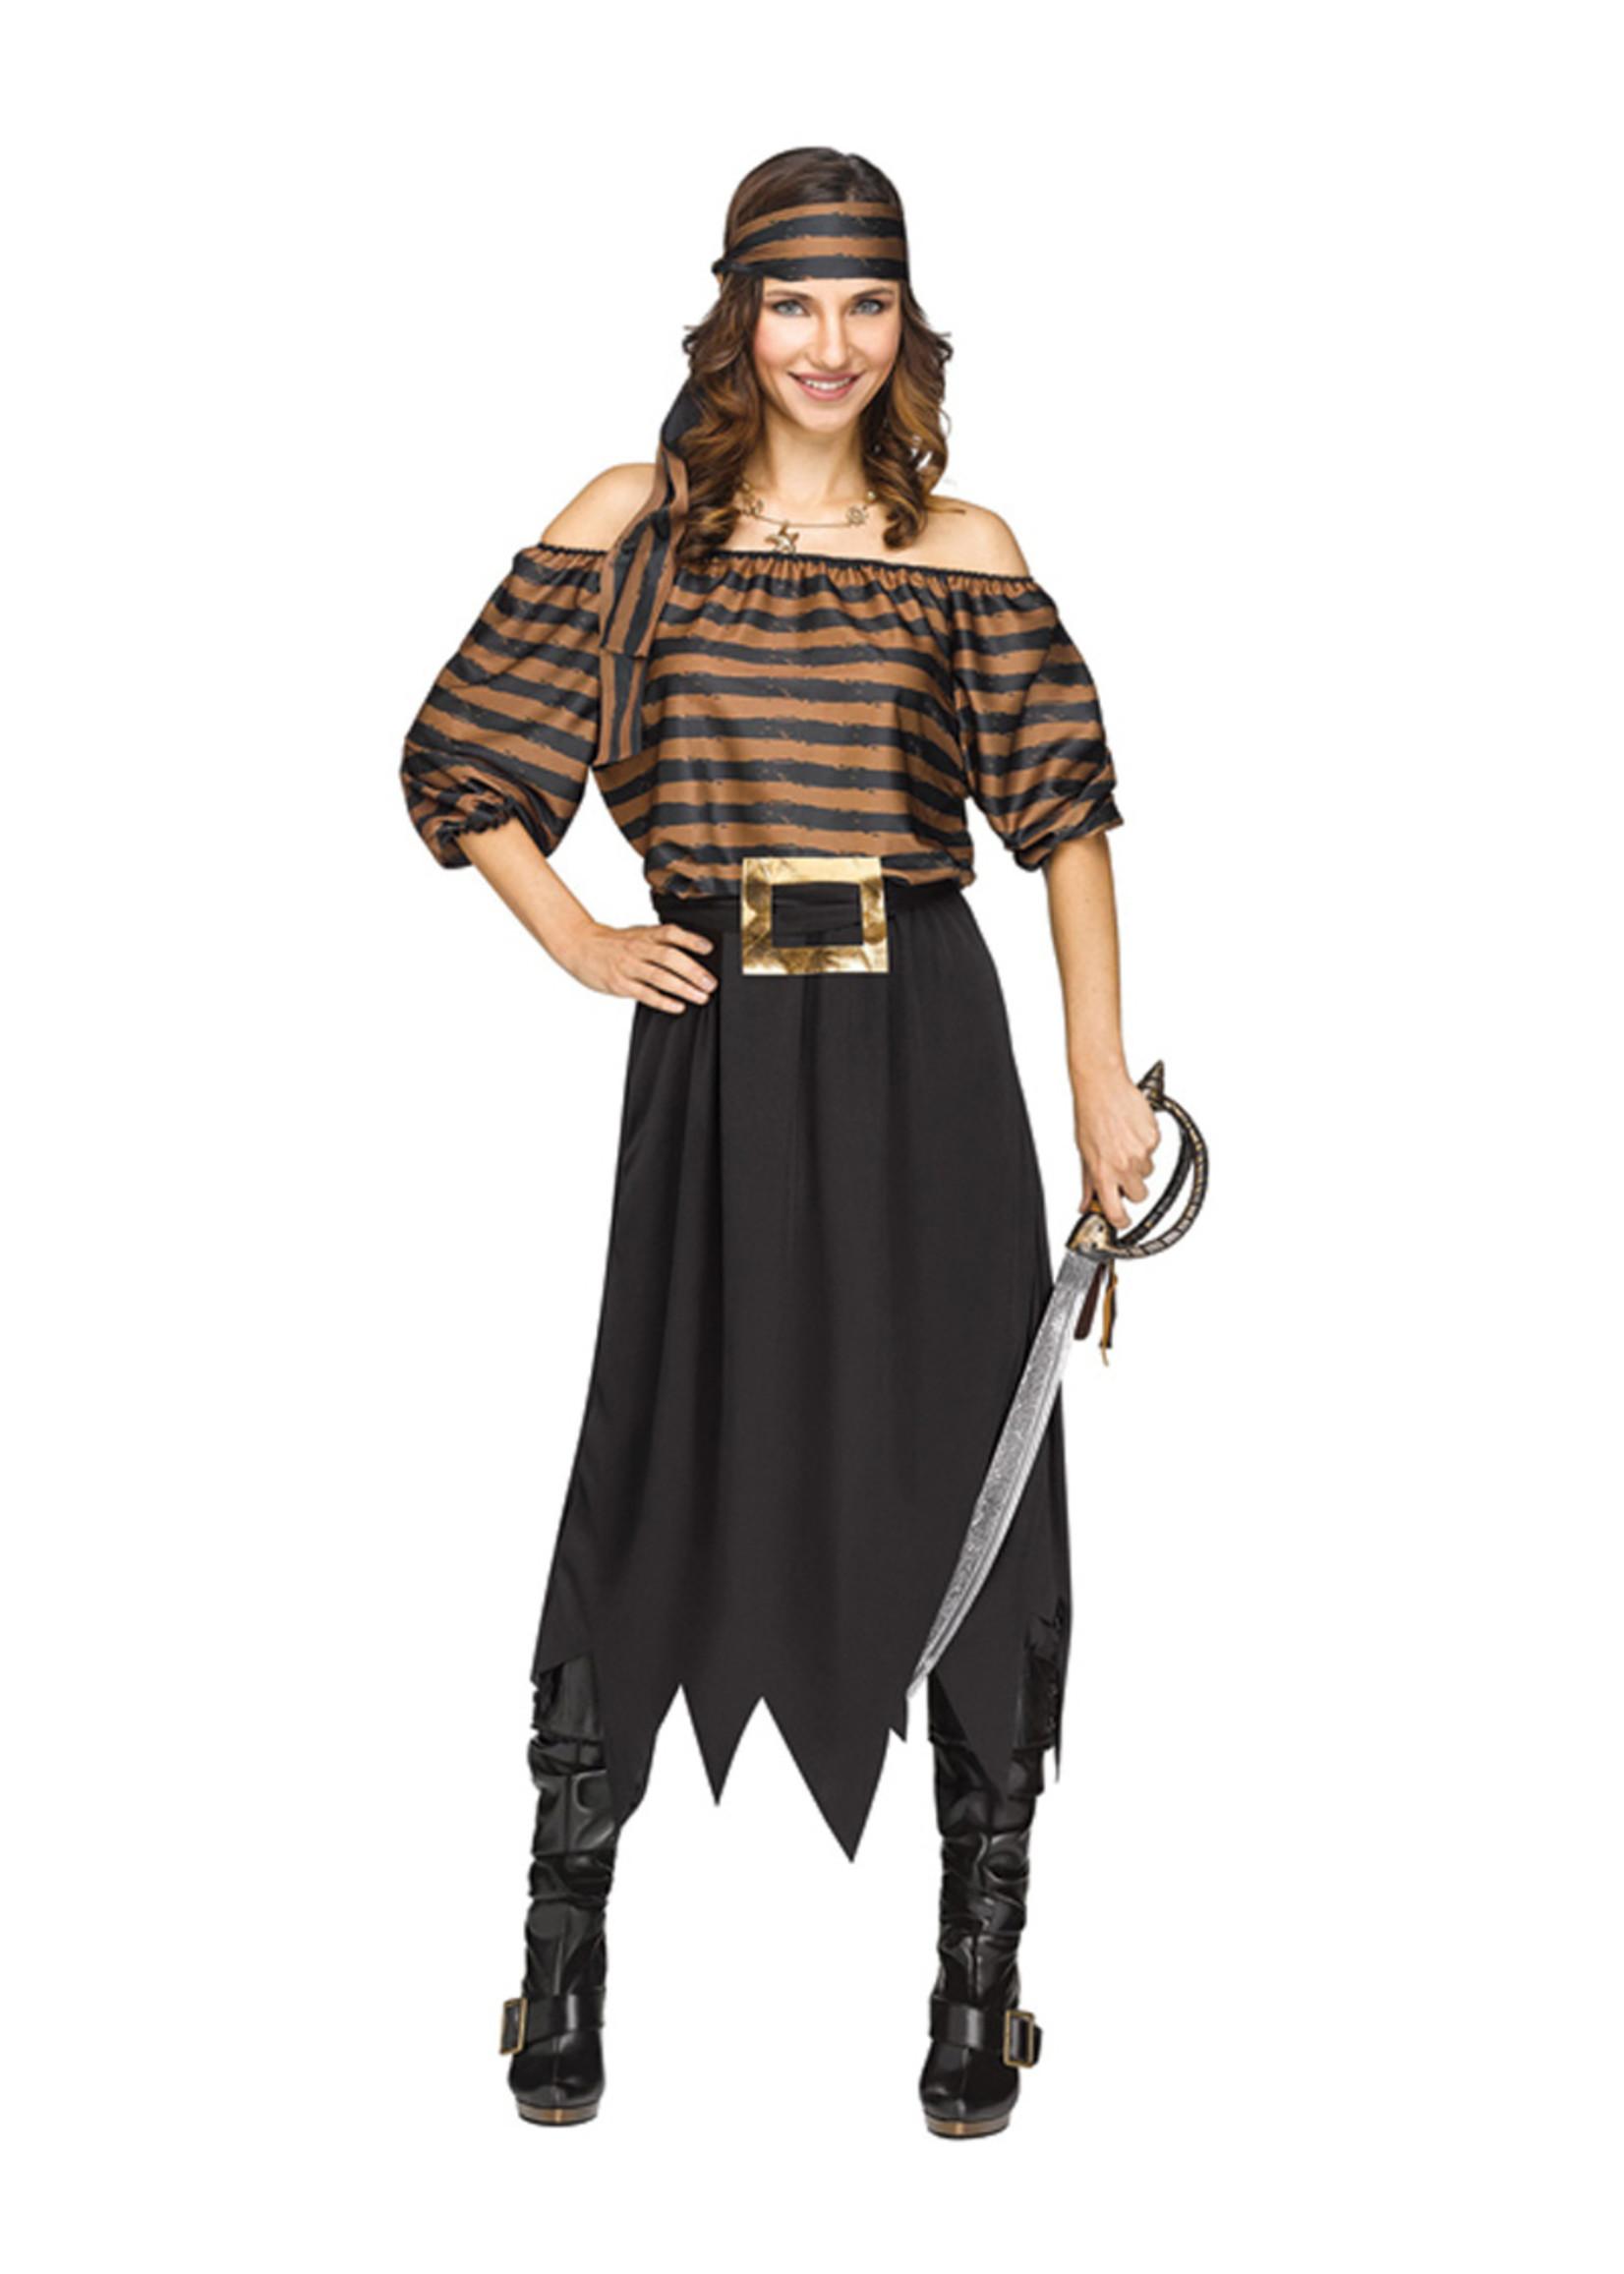 Sea Wench Costume - Women's